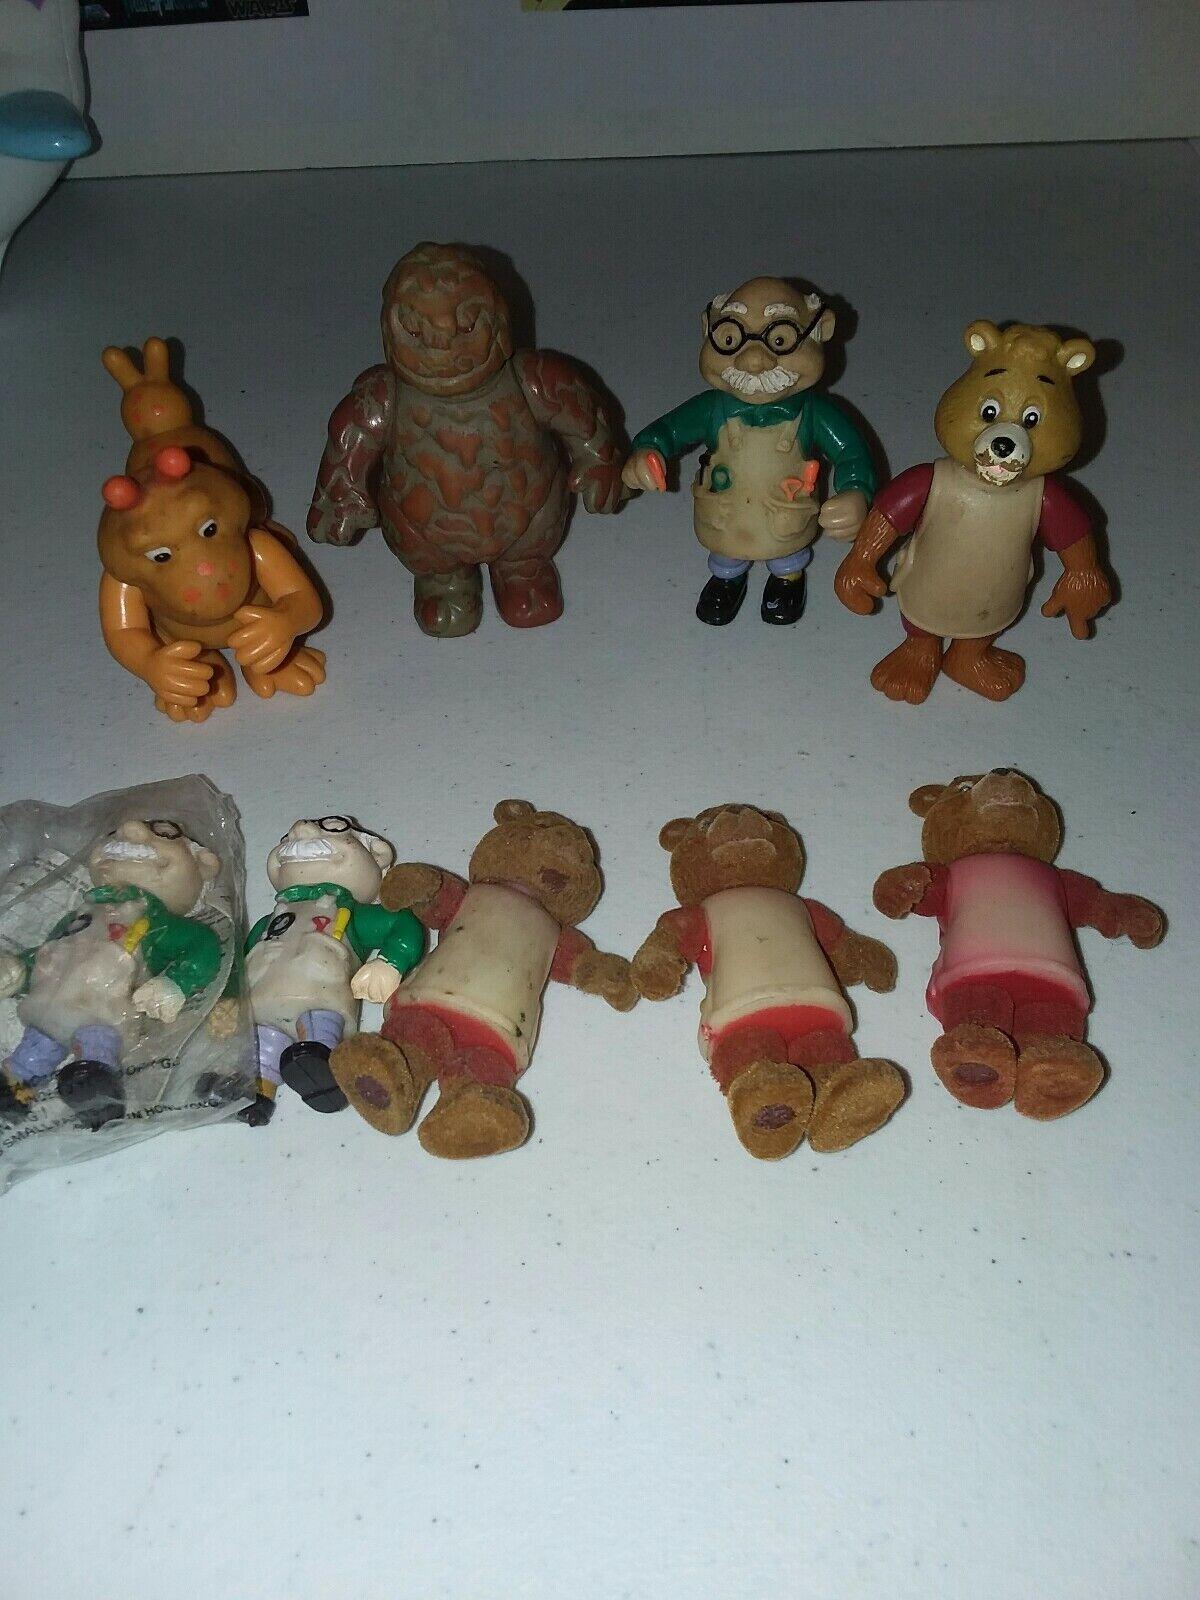 1985  86 Alchemy World Of Teddy Ruxpin  Wendy's Kid meal lot - Mudbluep   Grubby